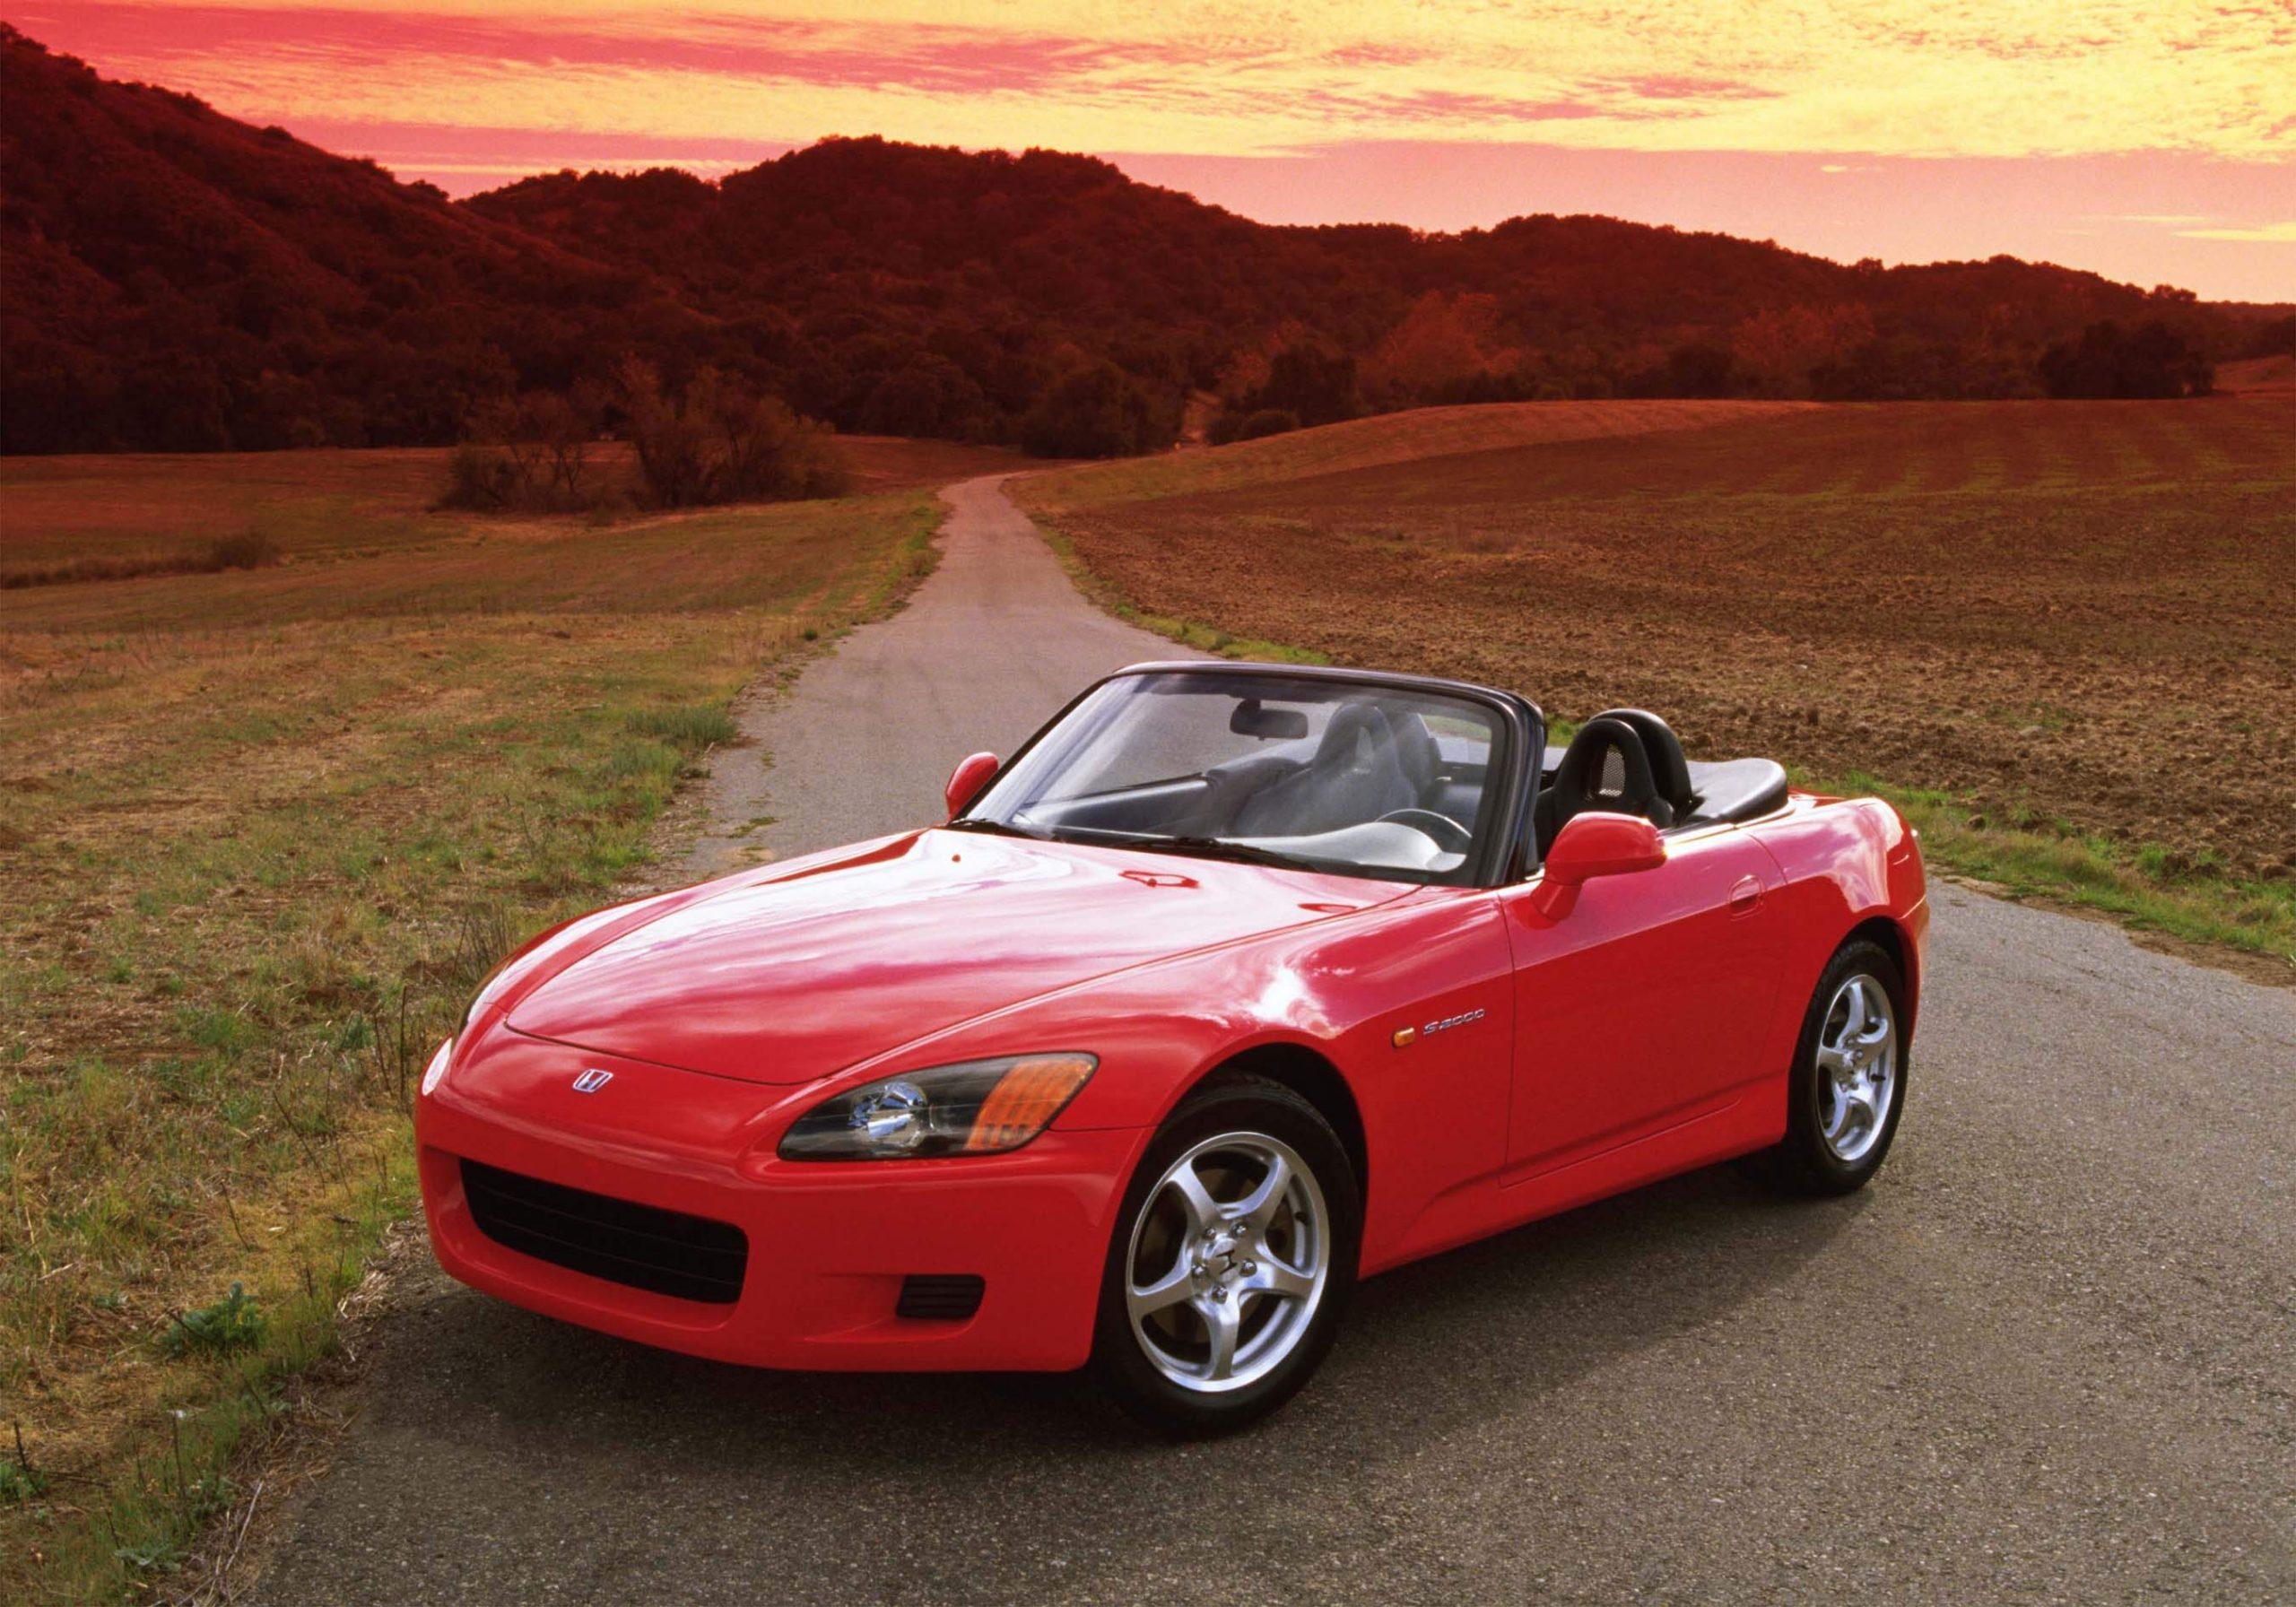 2000 S2000 Roadster